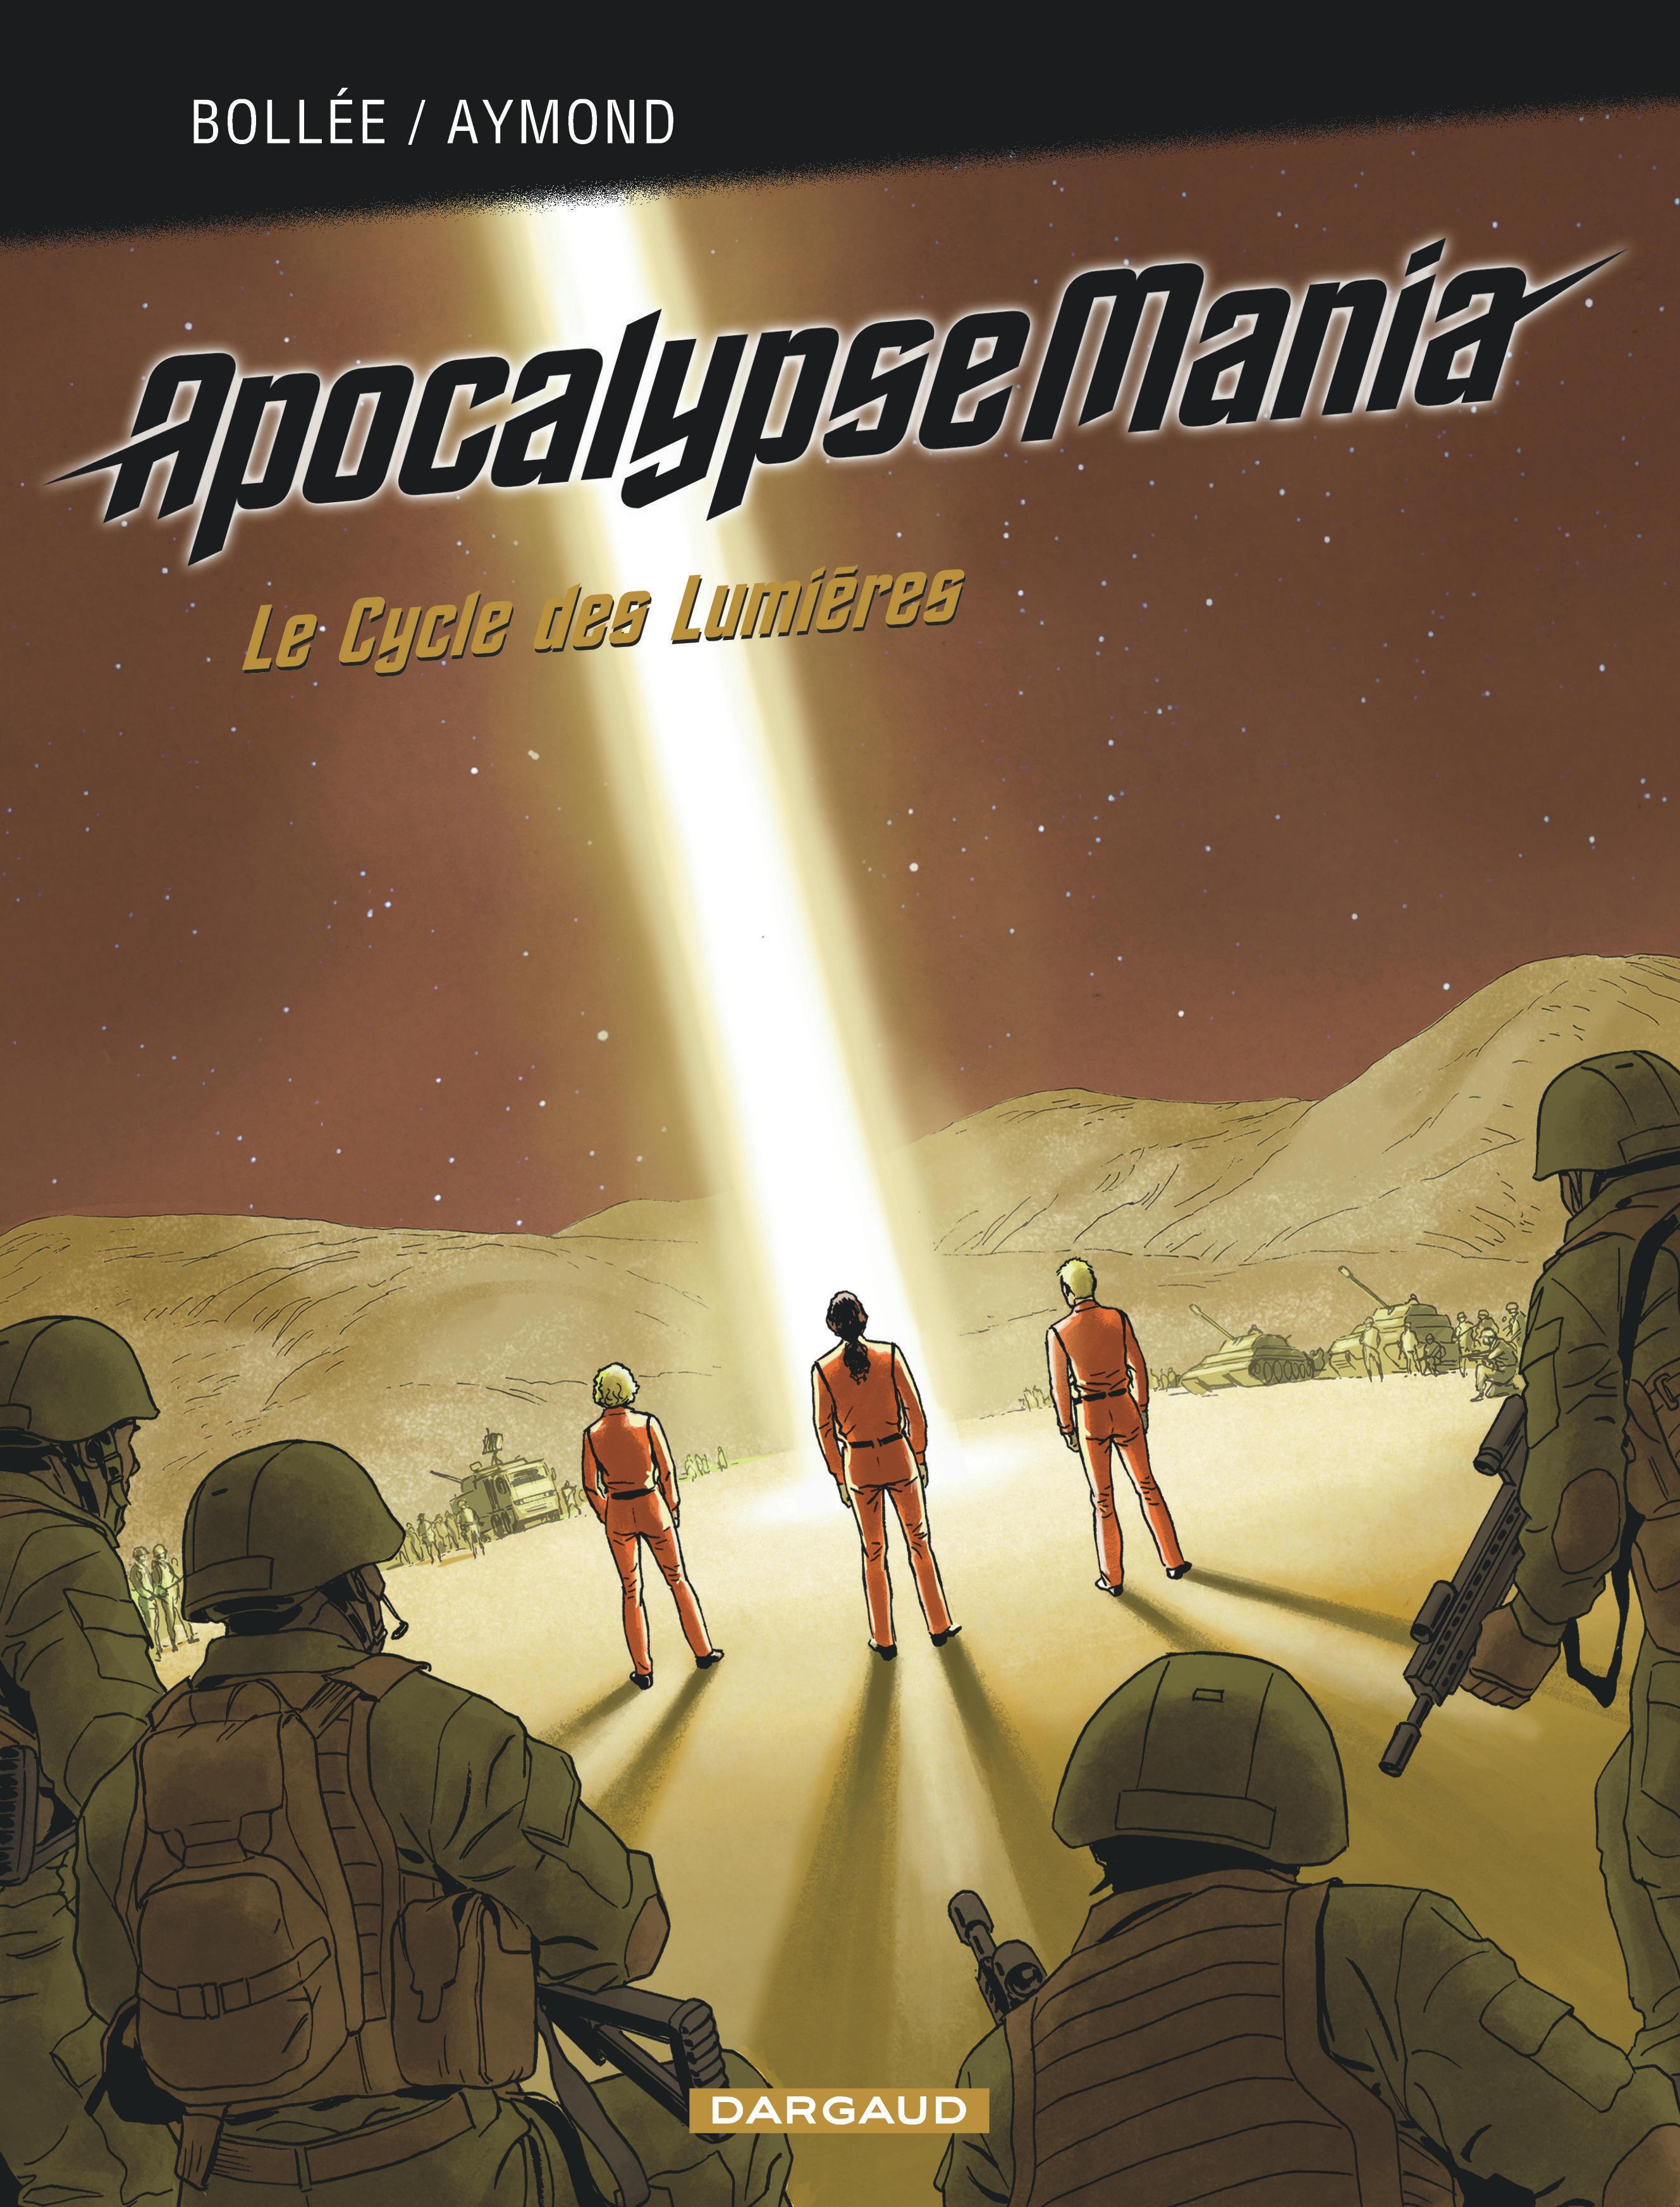 APOCALYPSE MANIA (INTEGRALE) - APOCALYPSE MANIA - INTEGRALE - TOME 1 - APOCALYPSE MANIA - INTEGRALE